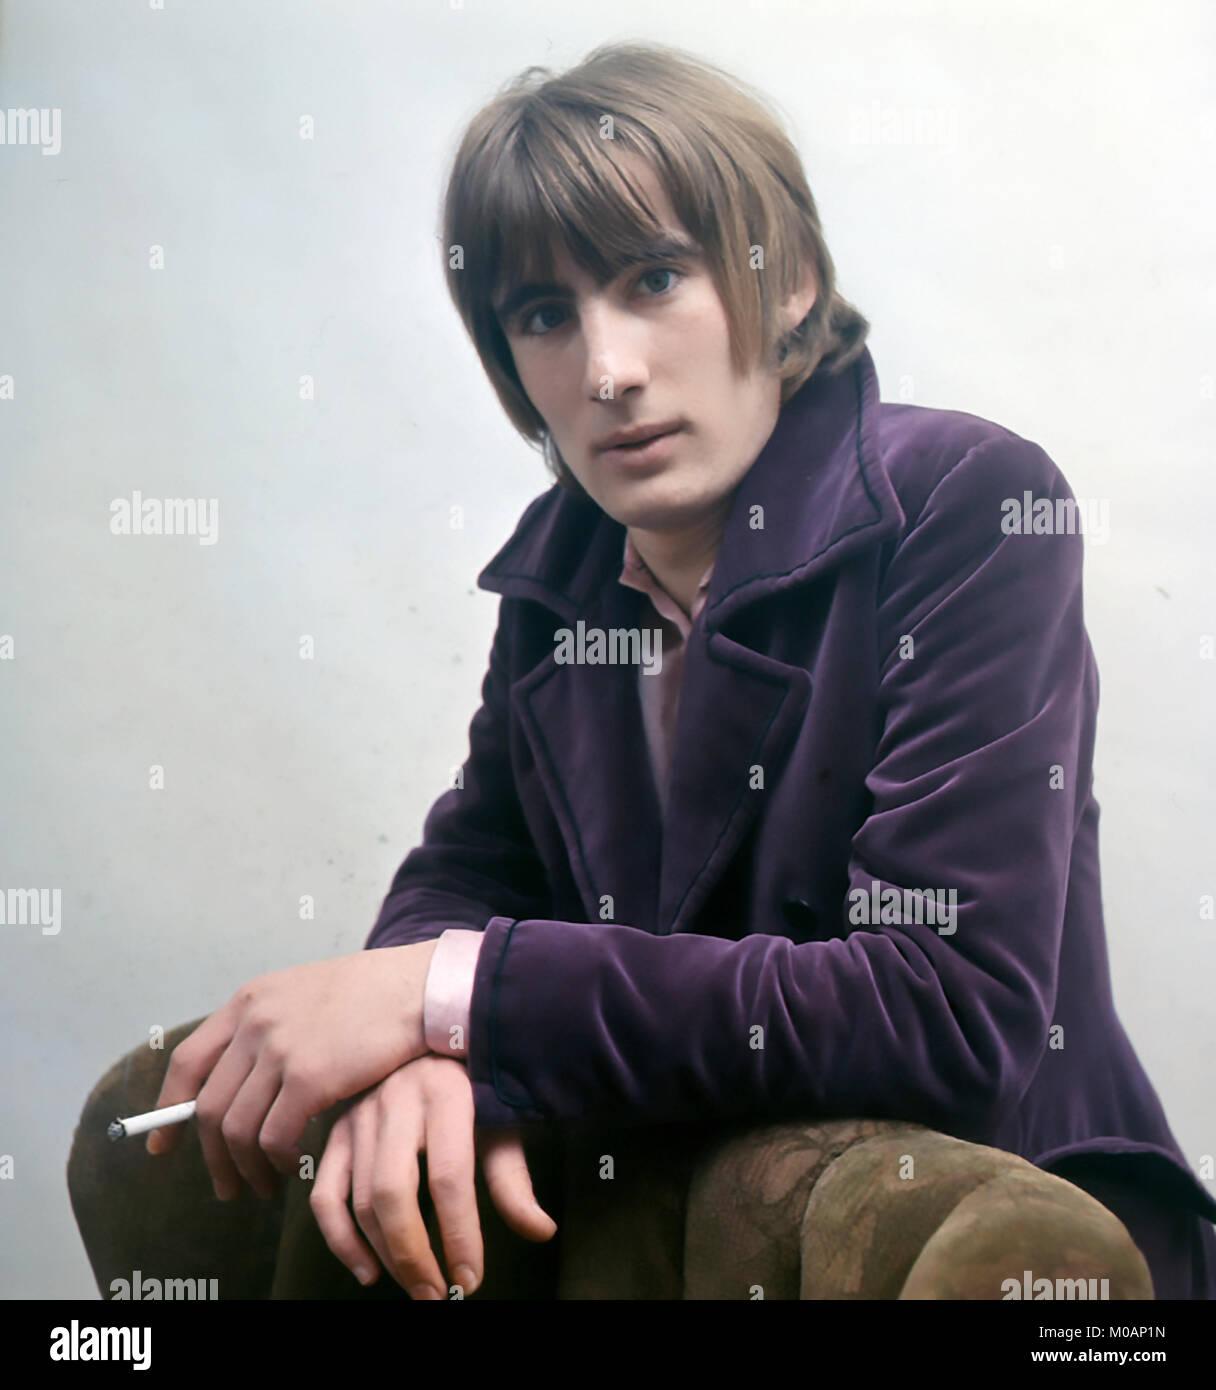 BIL CHENAIL Inglés modelo de moda masculina en mayo de 1967. Foto: Tony Gale Imagen De Stock